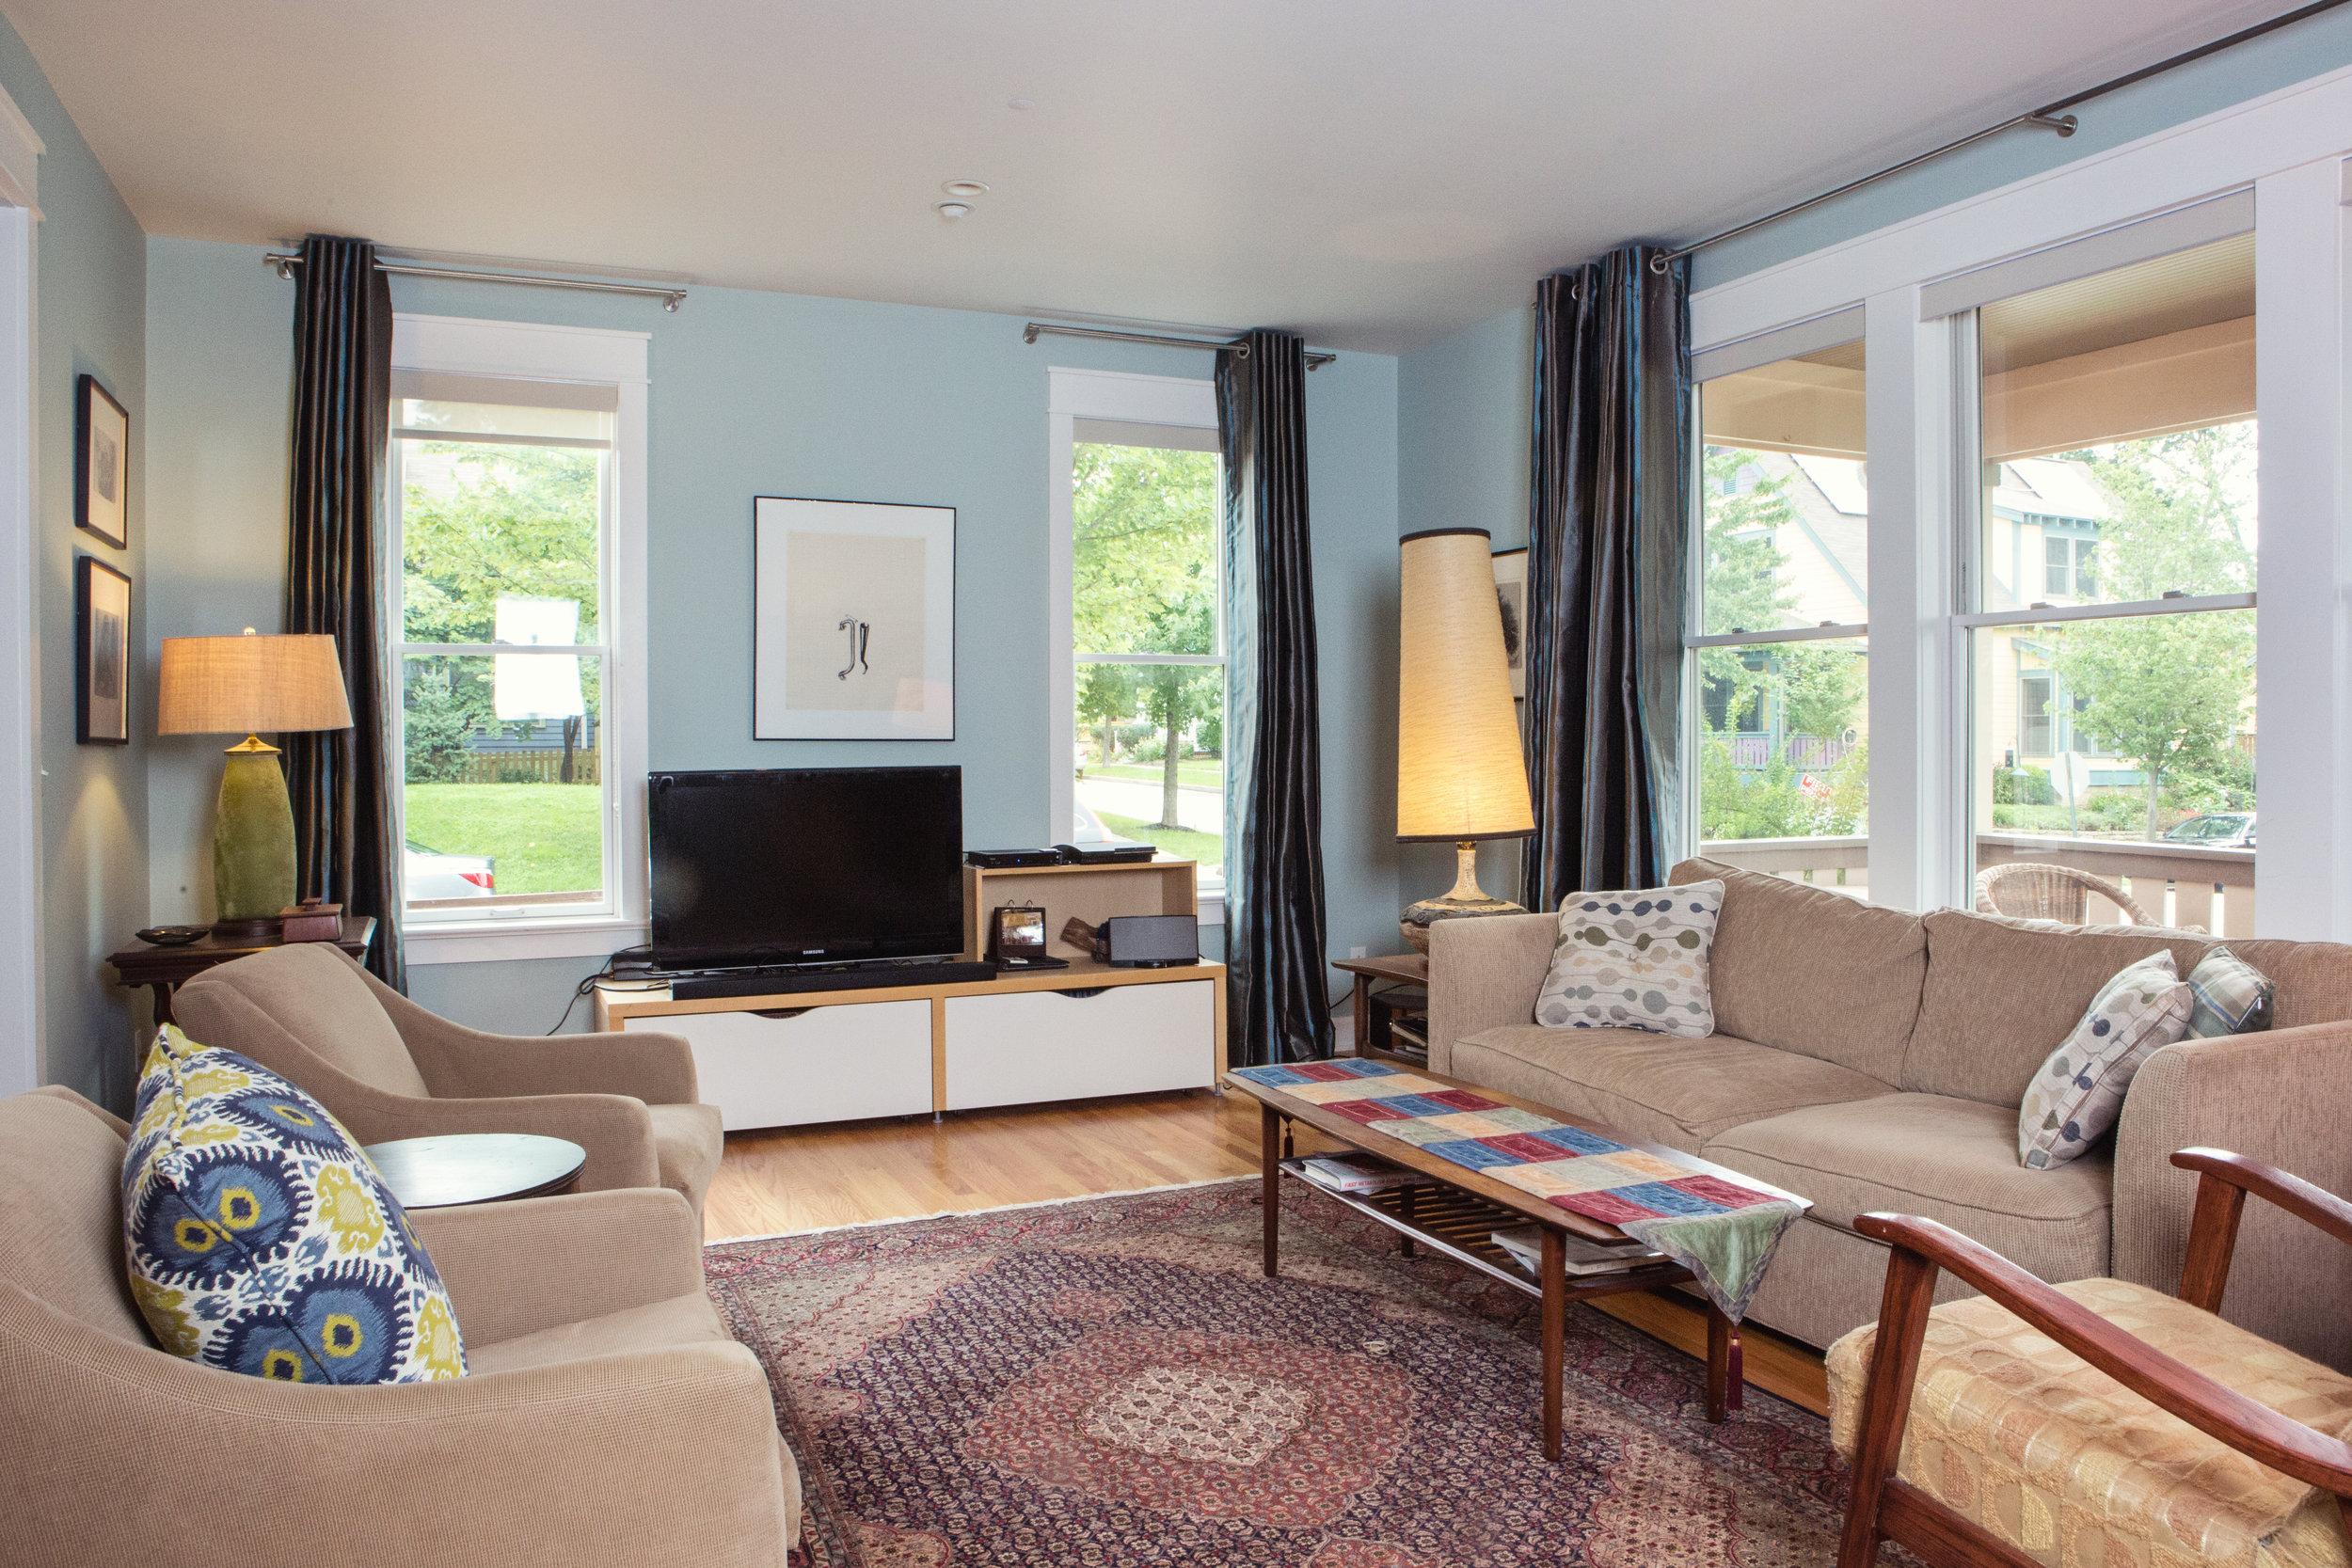 color-theory-painting-interior-beautiful-1.jpg